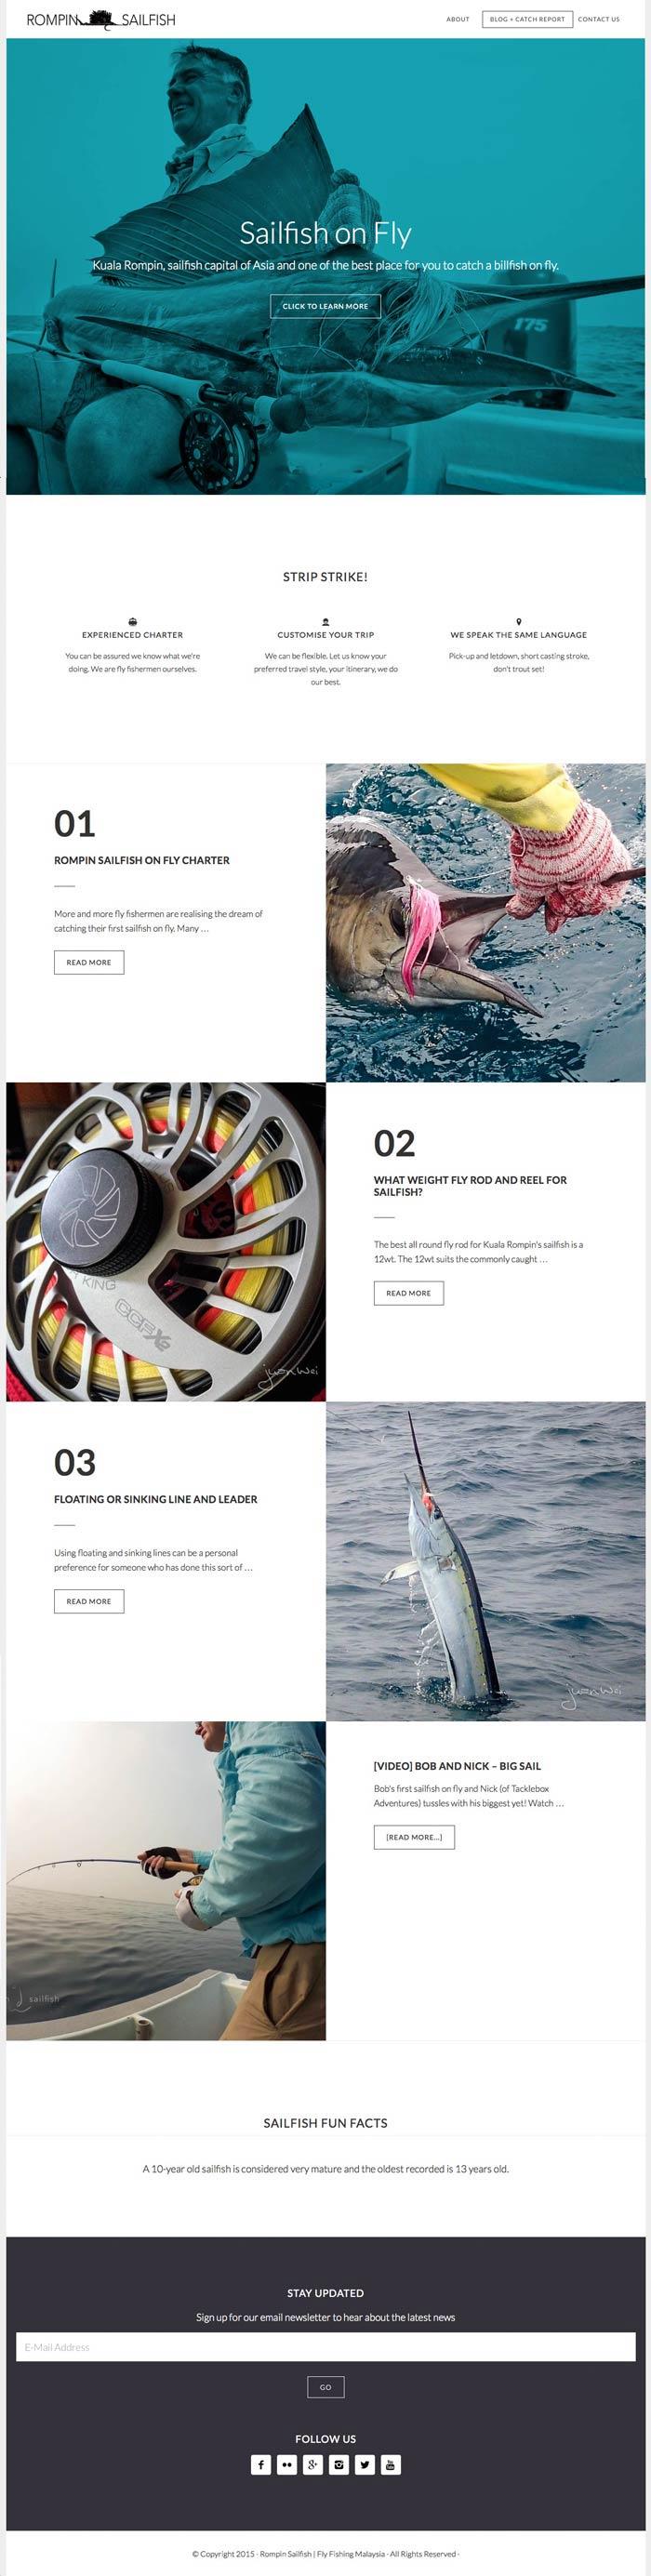 rompin-sailfish-fly-fishing-malaysia_